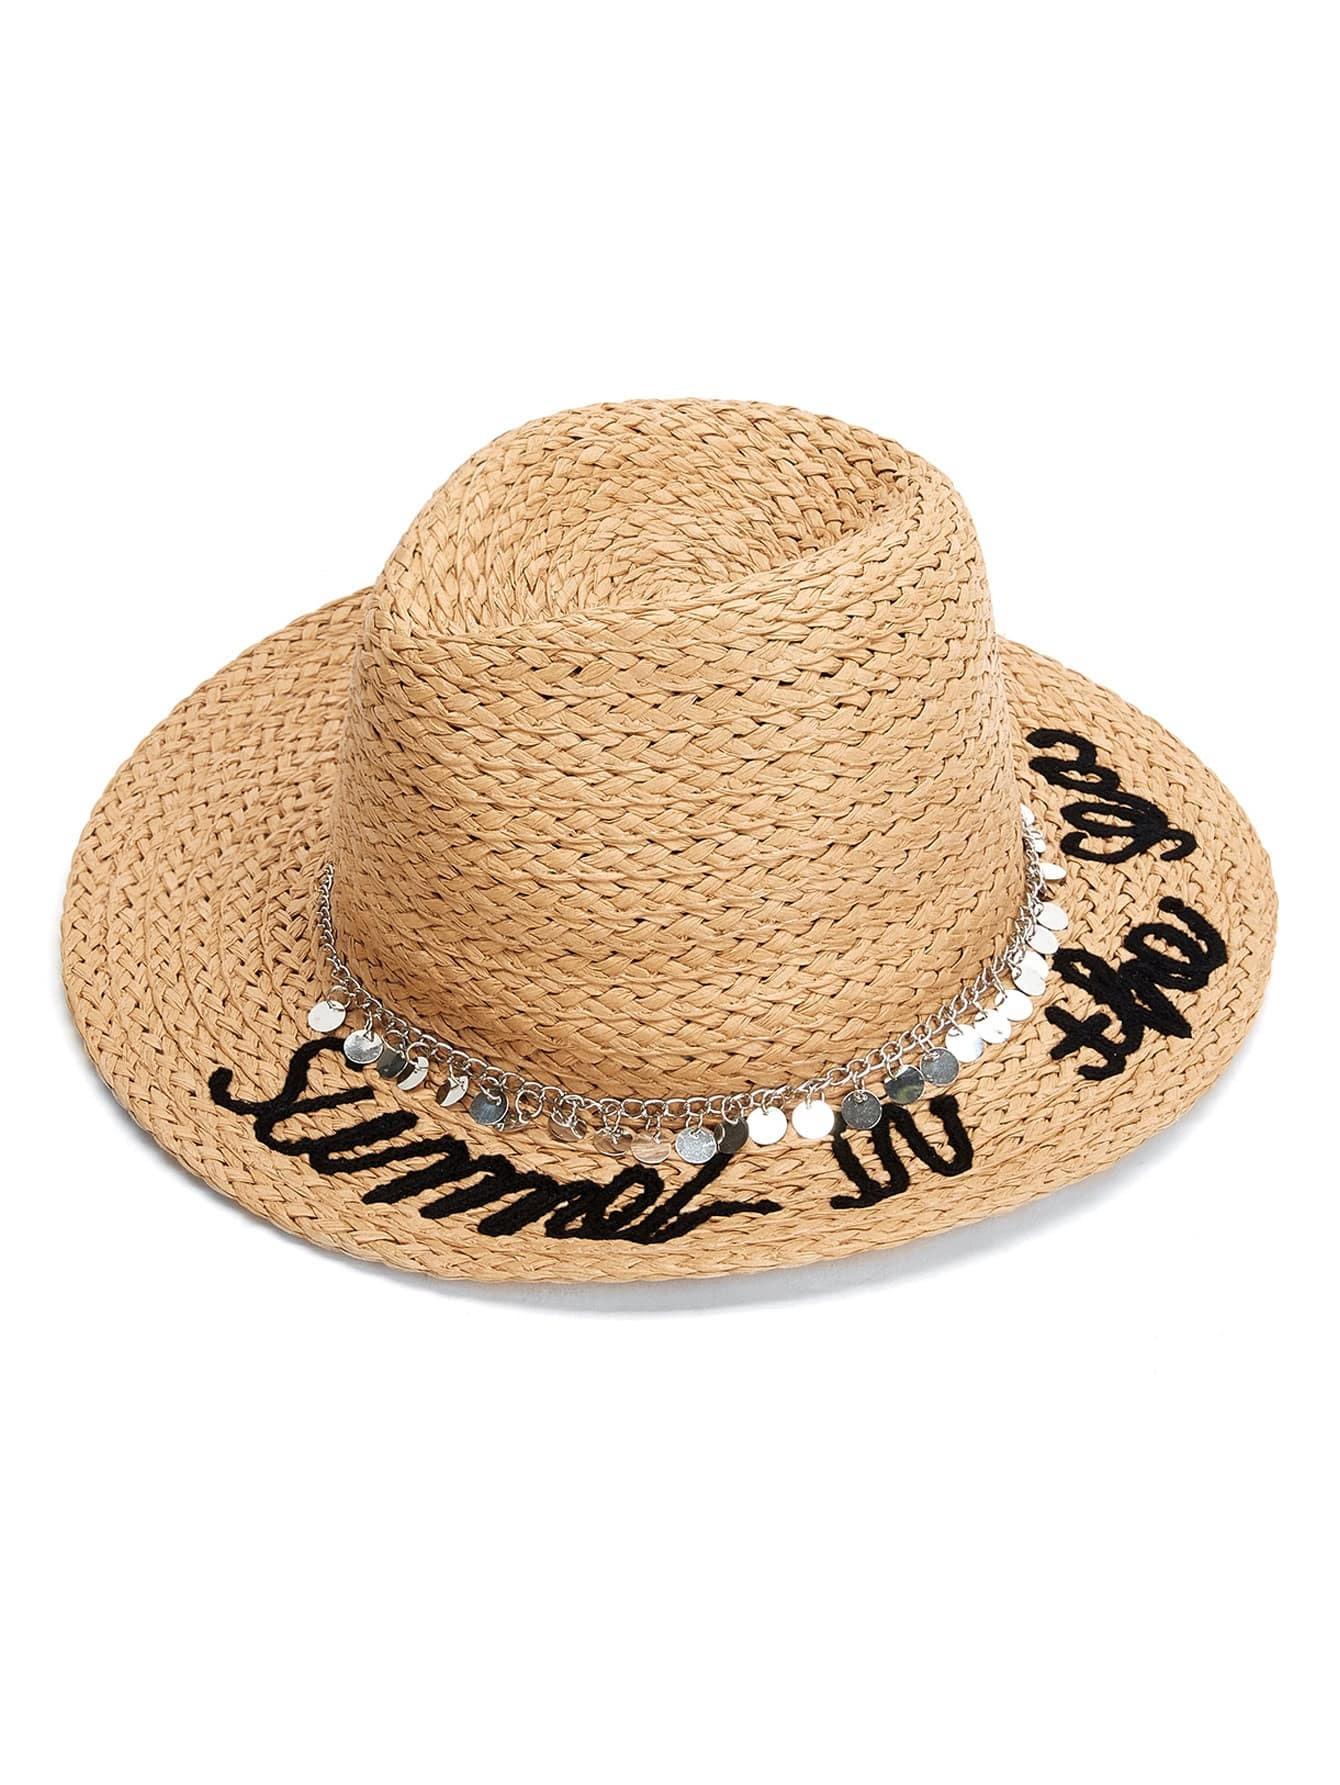 Chain Decorated Straw Fedora Hat